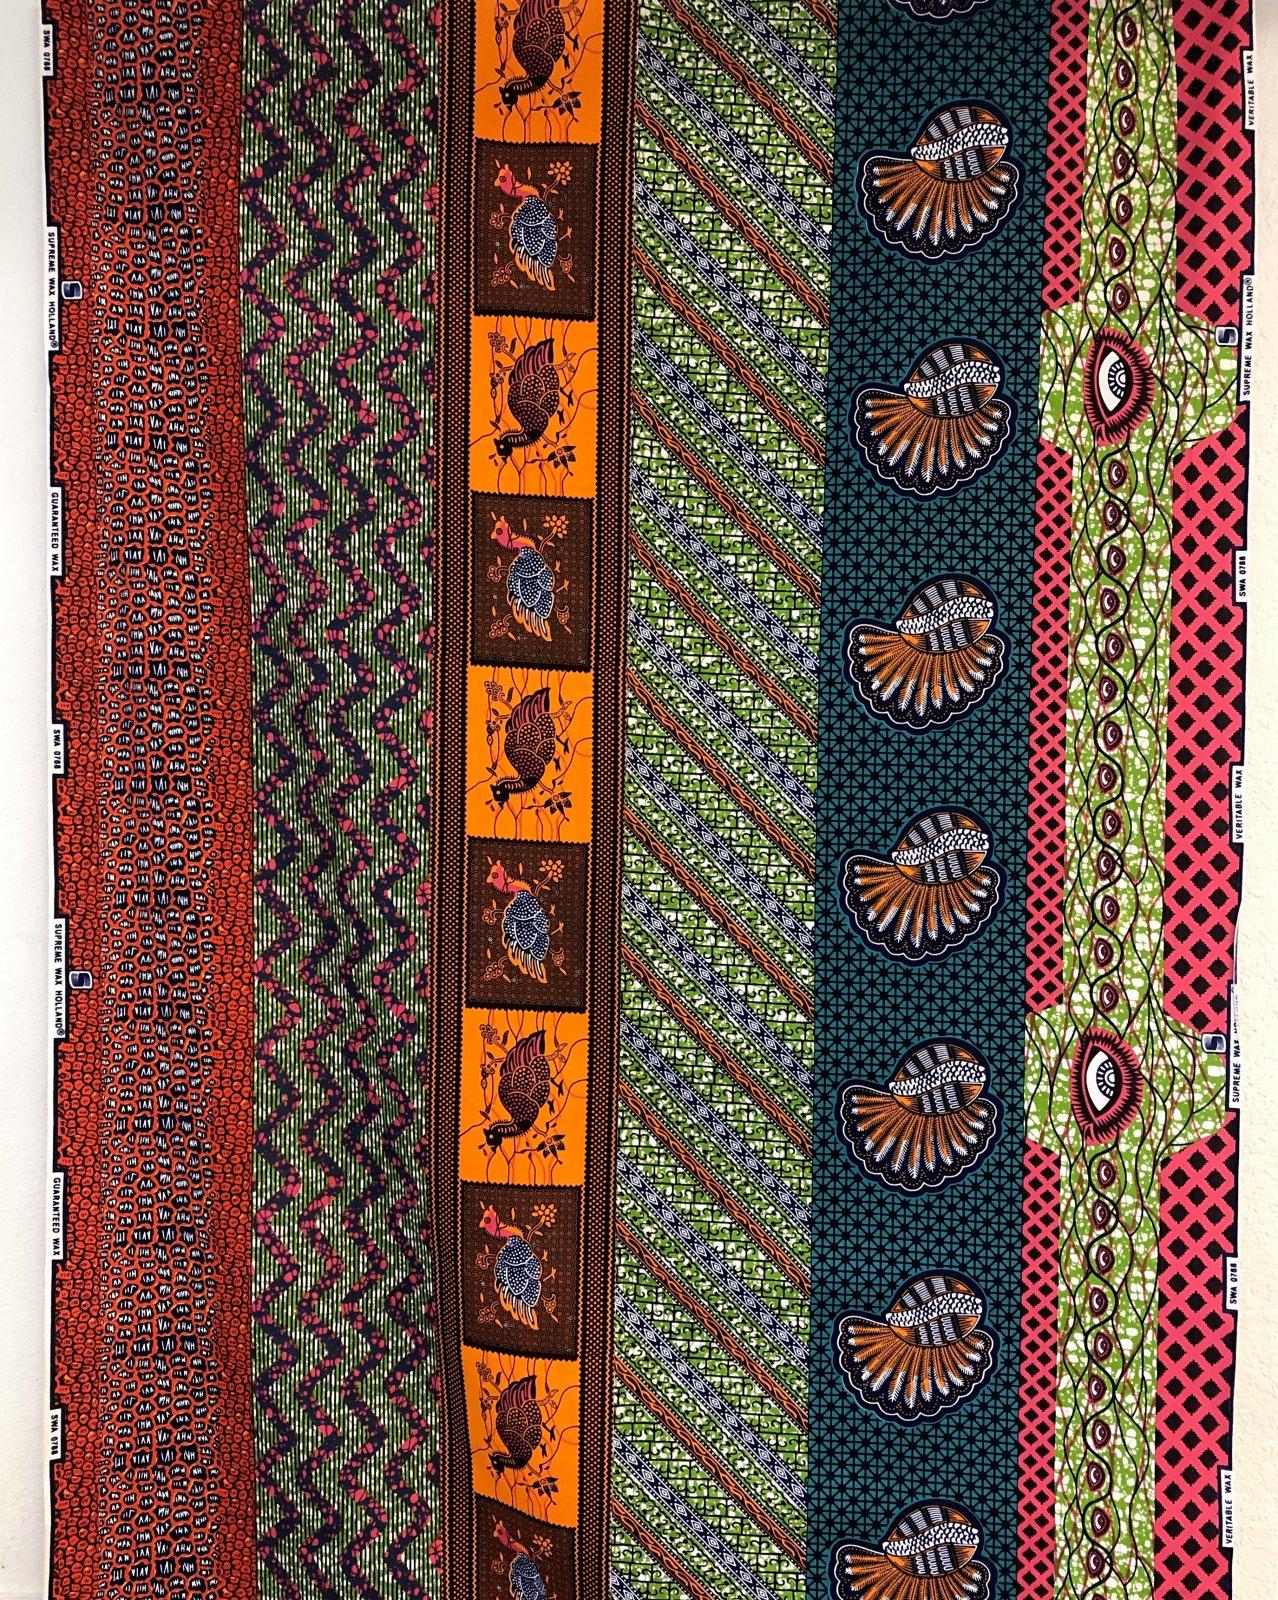 African Wax Print - Eyes, Shells, Ansan - Green